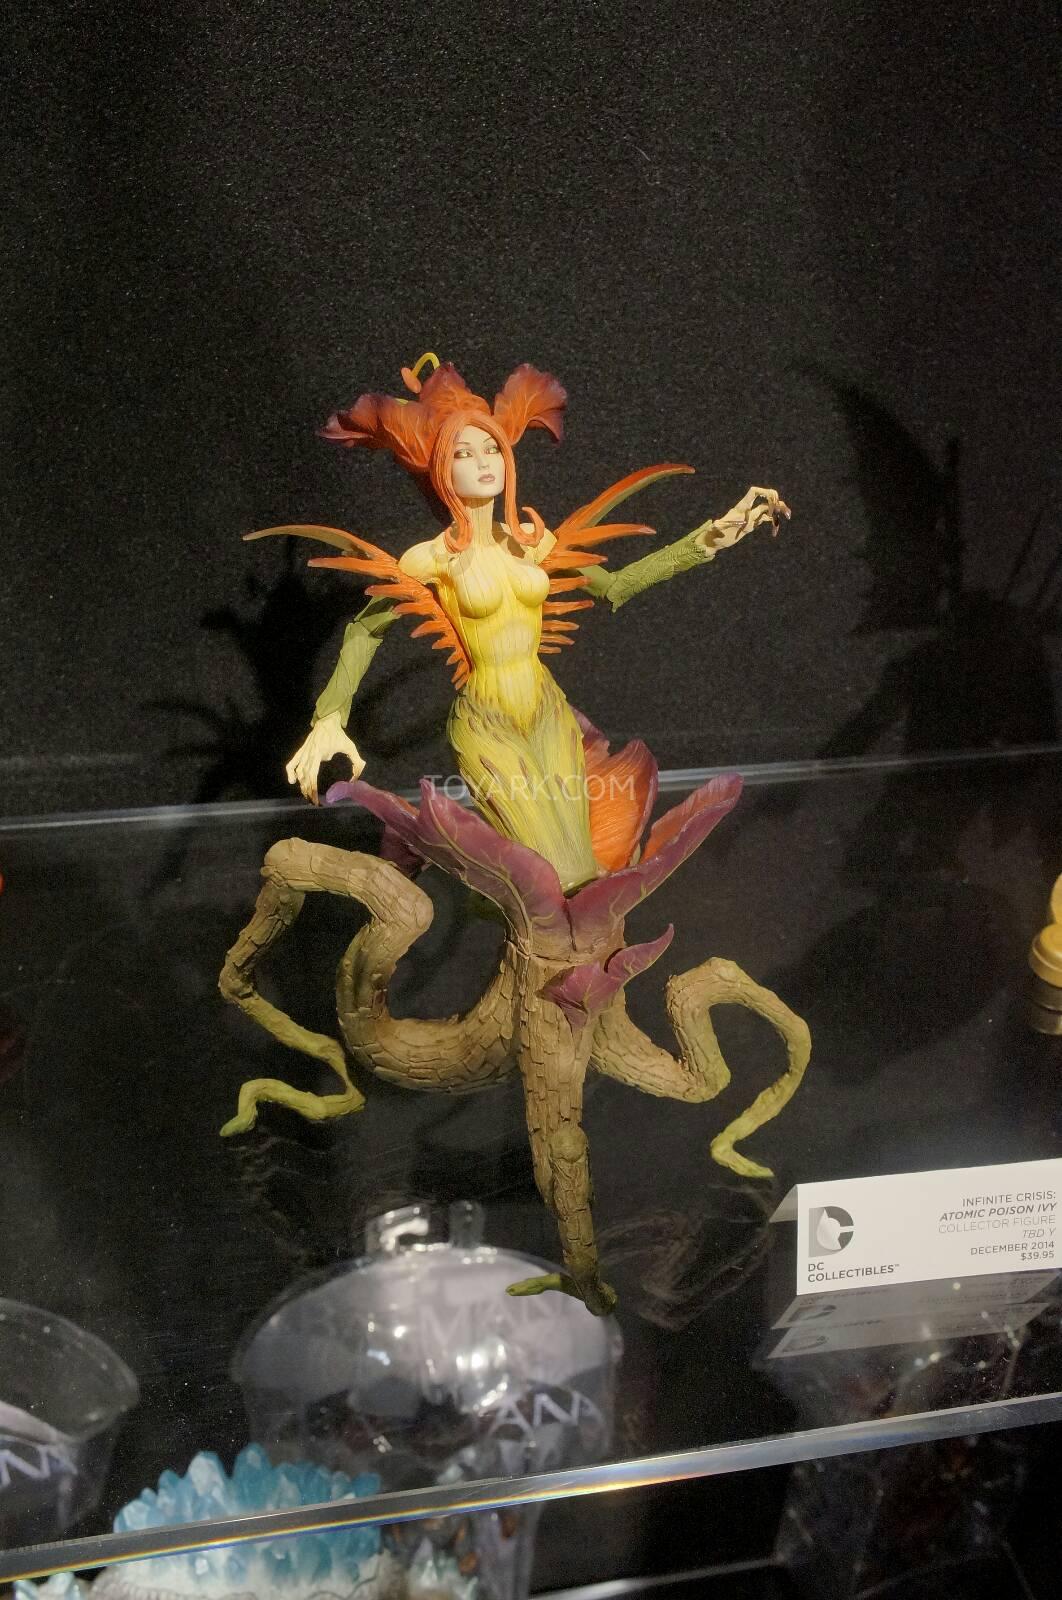 [Toy Fair 2014] DC Collectibles Toy-Fair-2014-DC-Collectibles-140